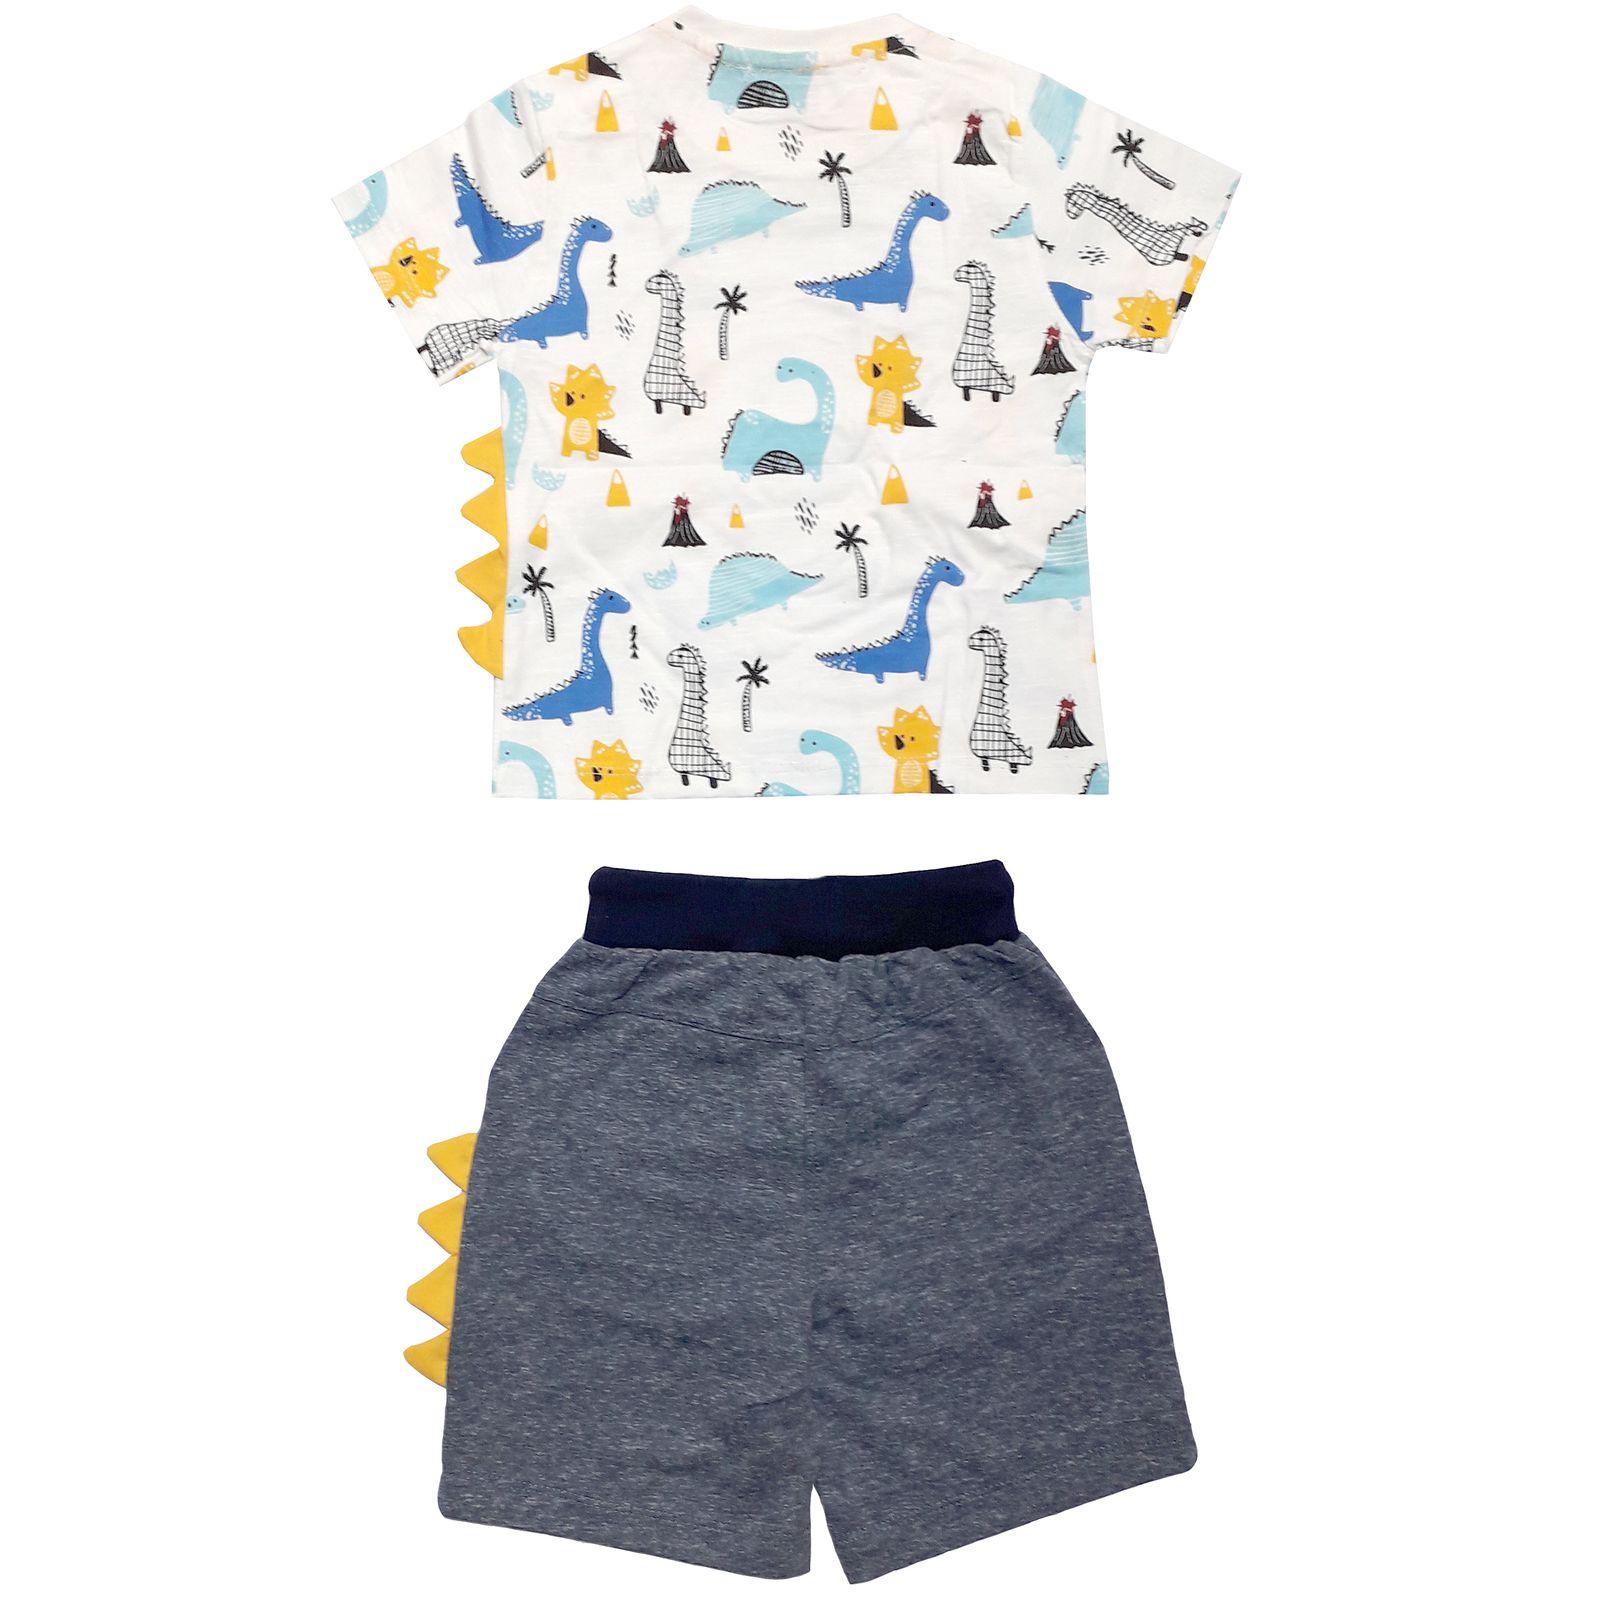 ست تی شرت و شلوارک پسرانه طرح دایناسور کد 2041 -  - 4